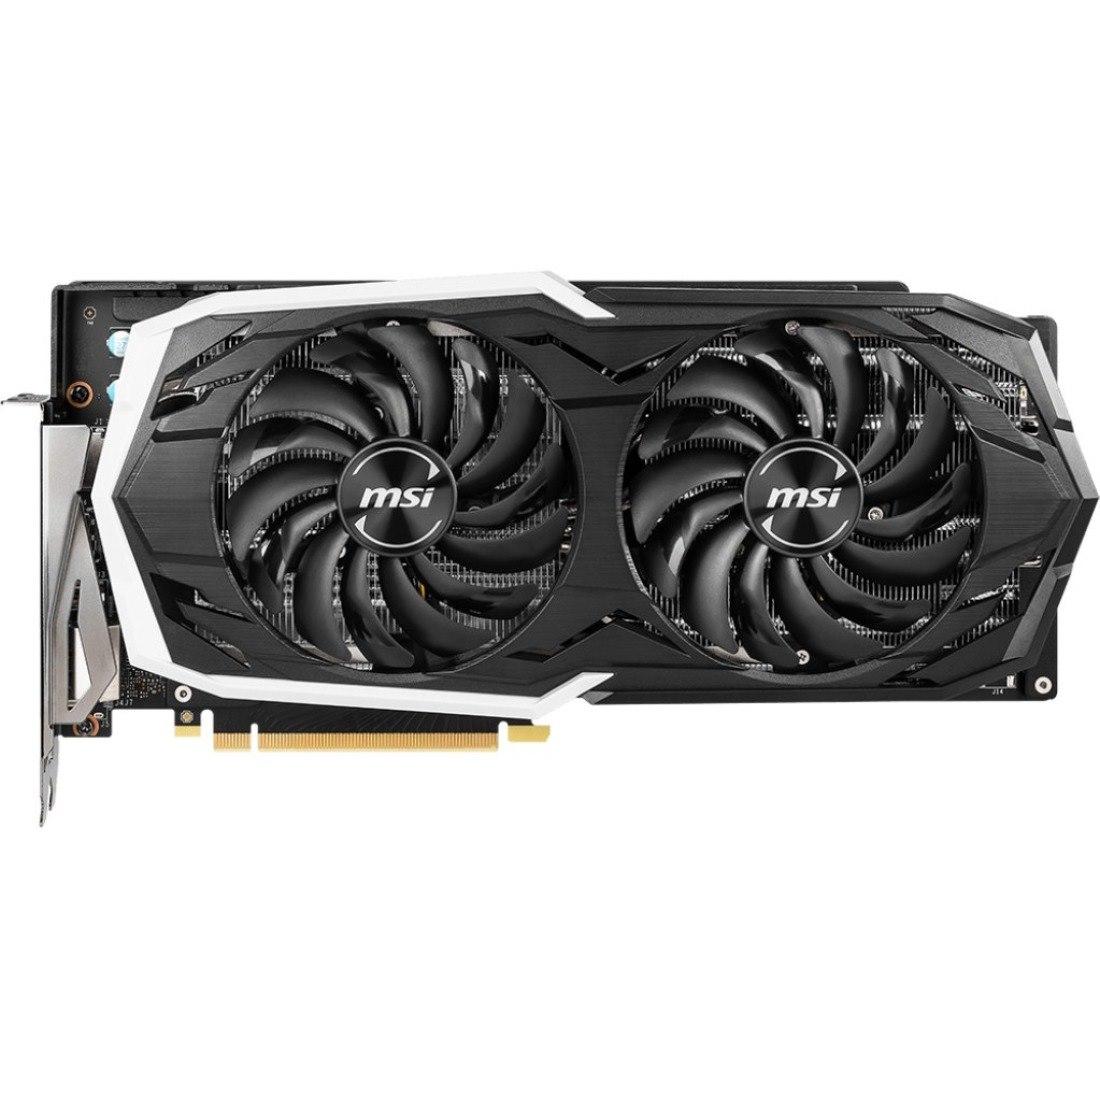 MSI ARMOR RTX 2070 ARMOR 8G GeForce RTX 2070 Graphic Card - 8 GB GDDR6